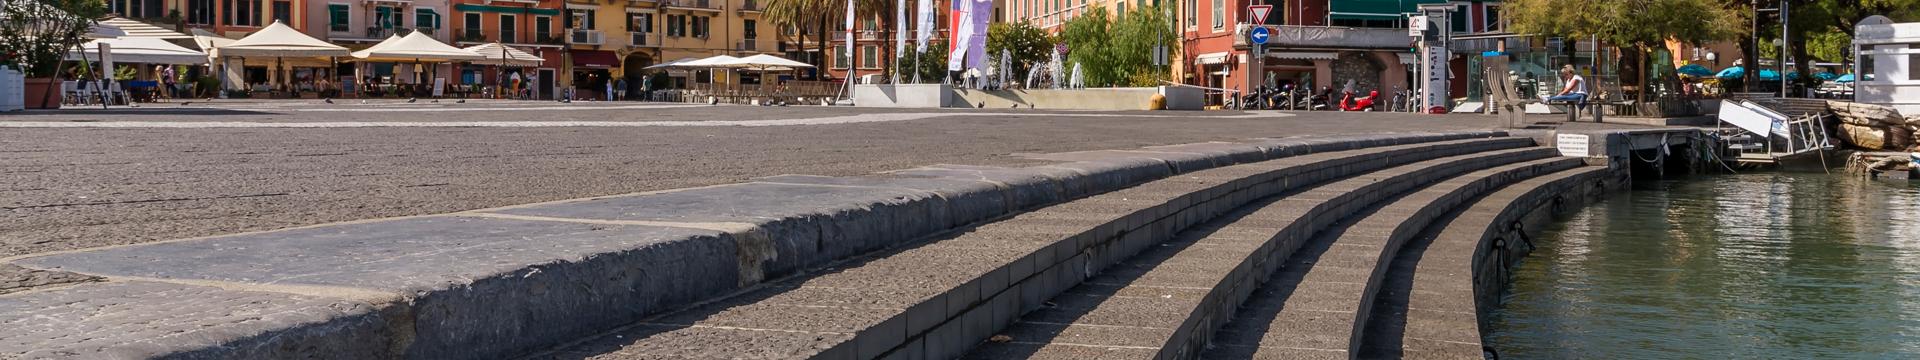 Porto Garibaldi